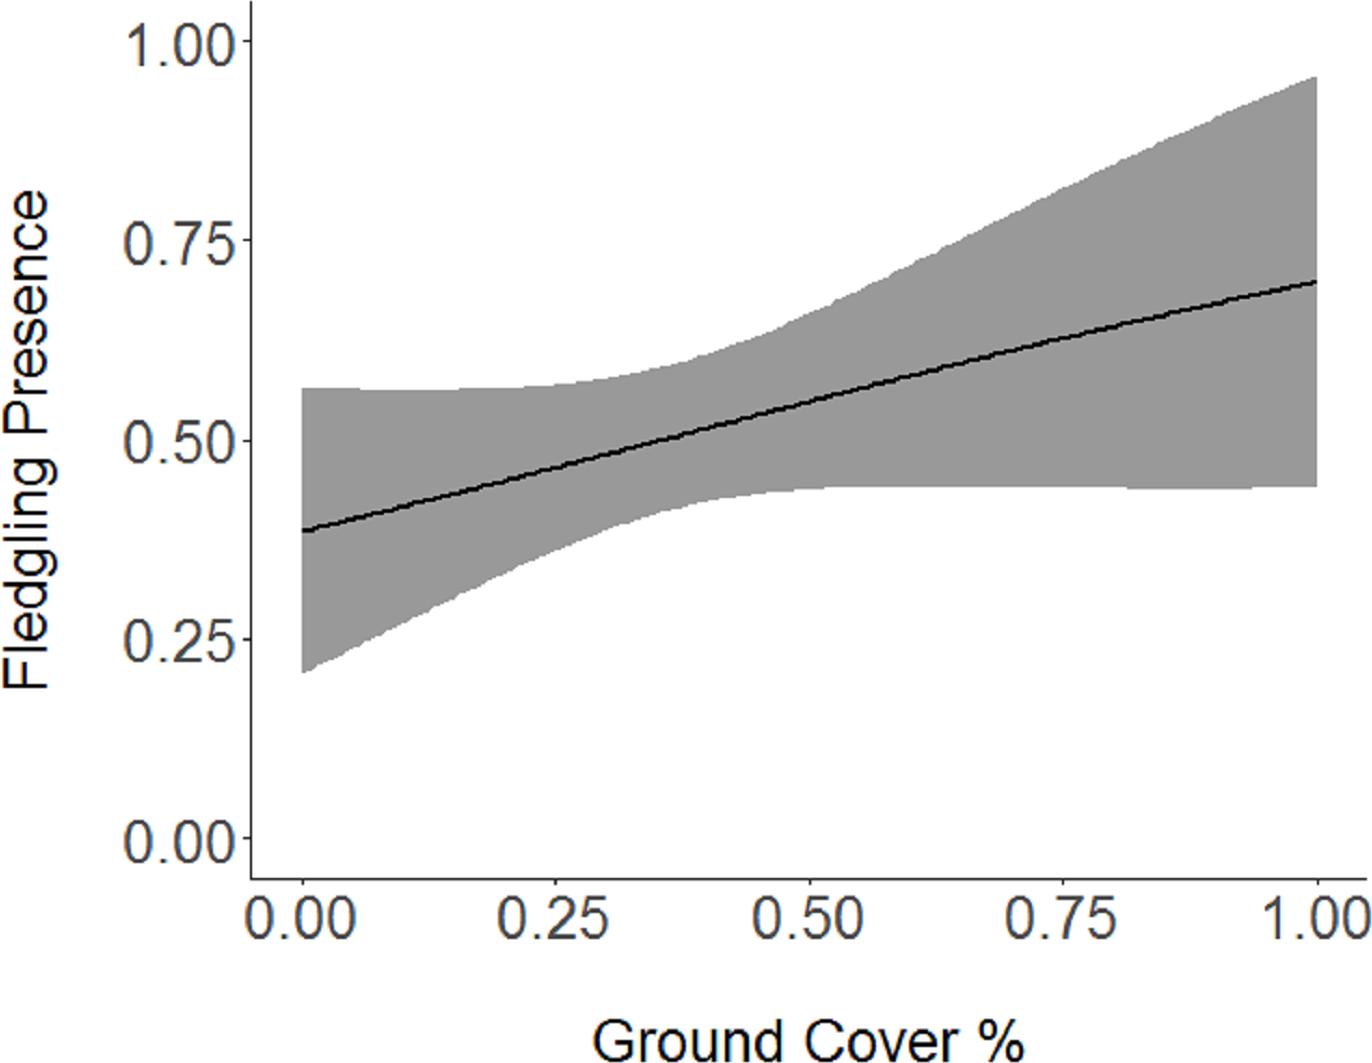 Post-fledging habitat use in a declining songbird [PeerJ]